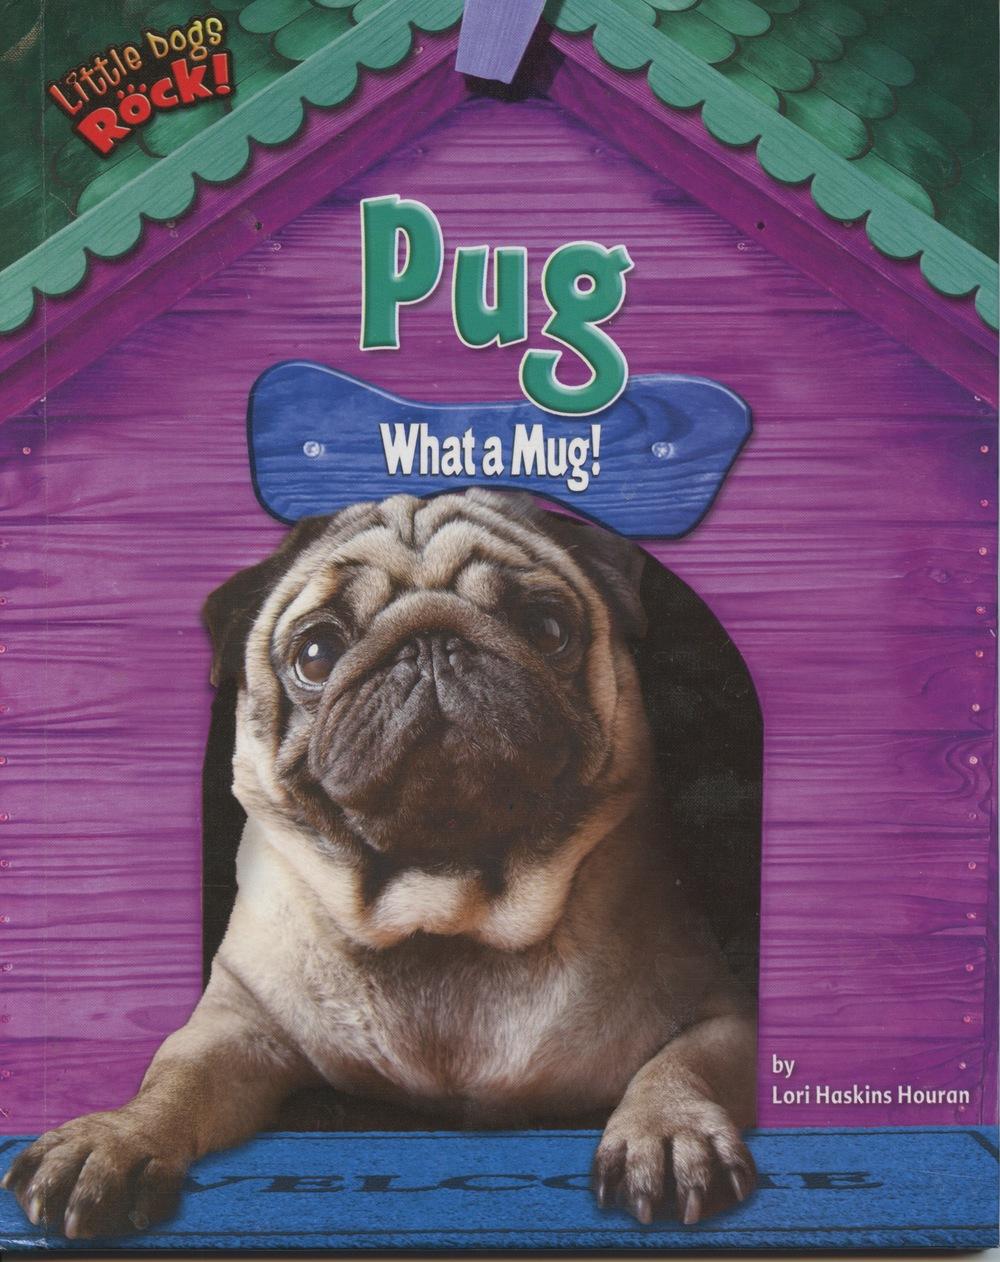 Pug cover.jpeg